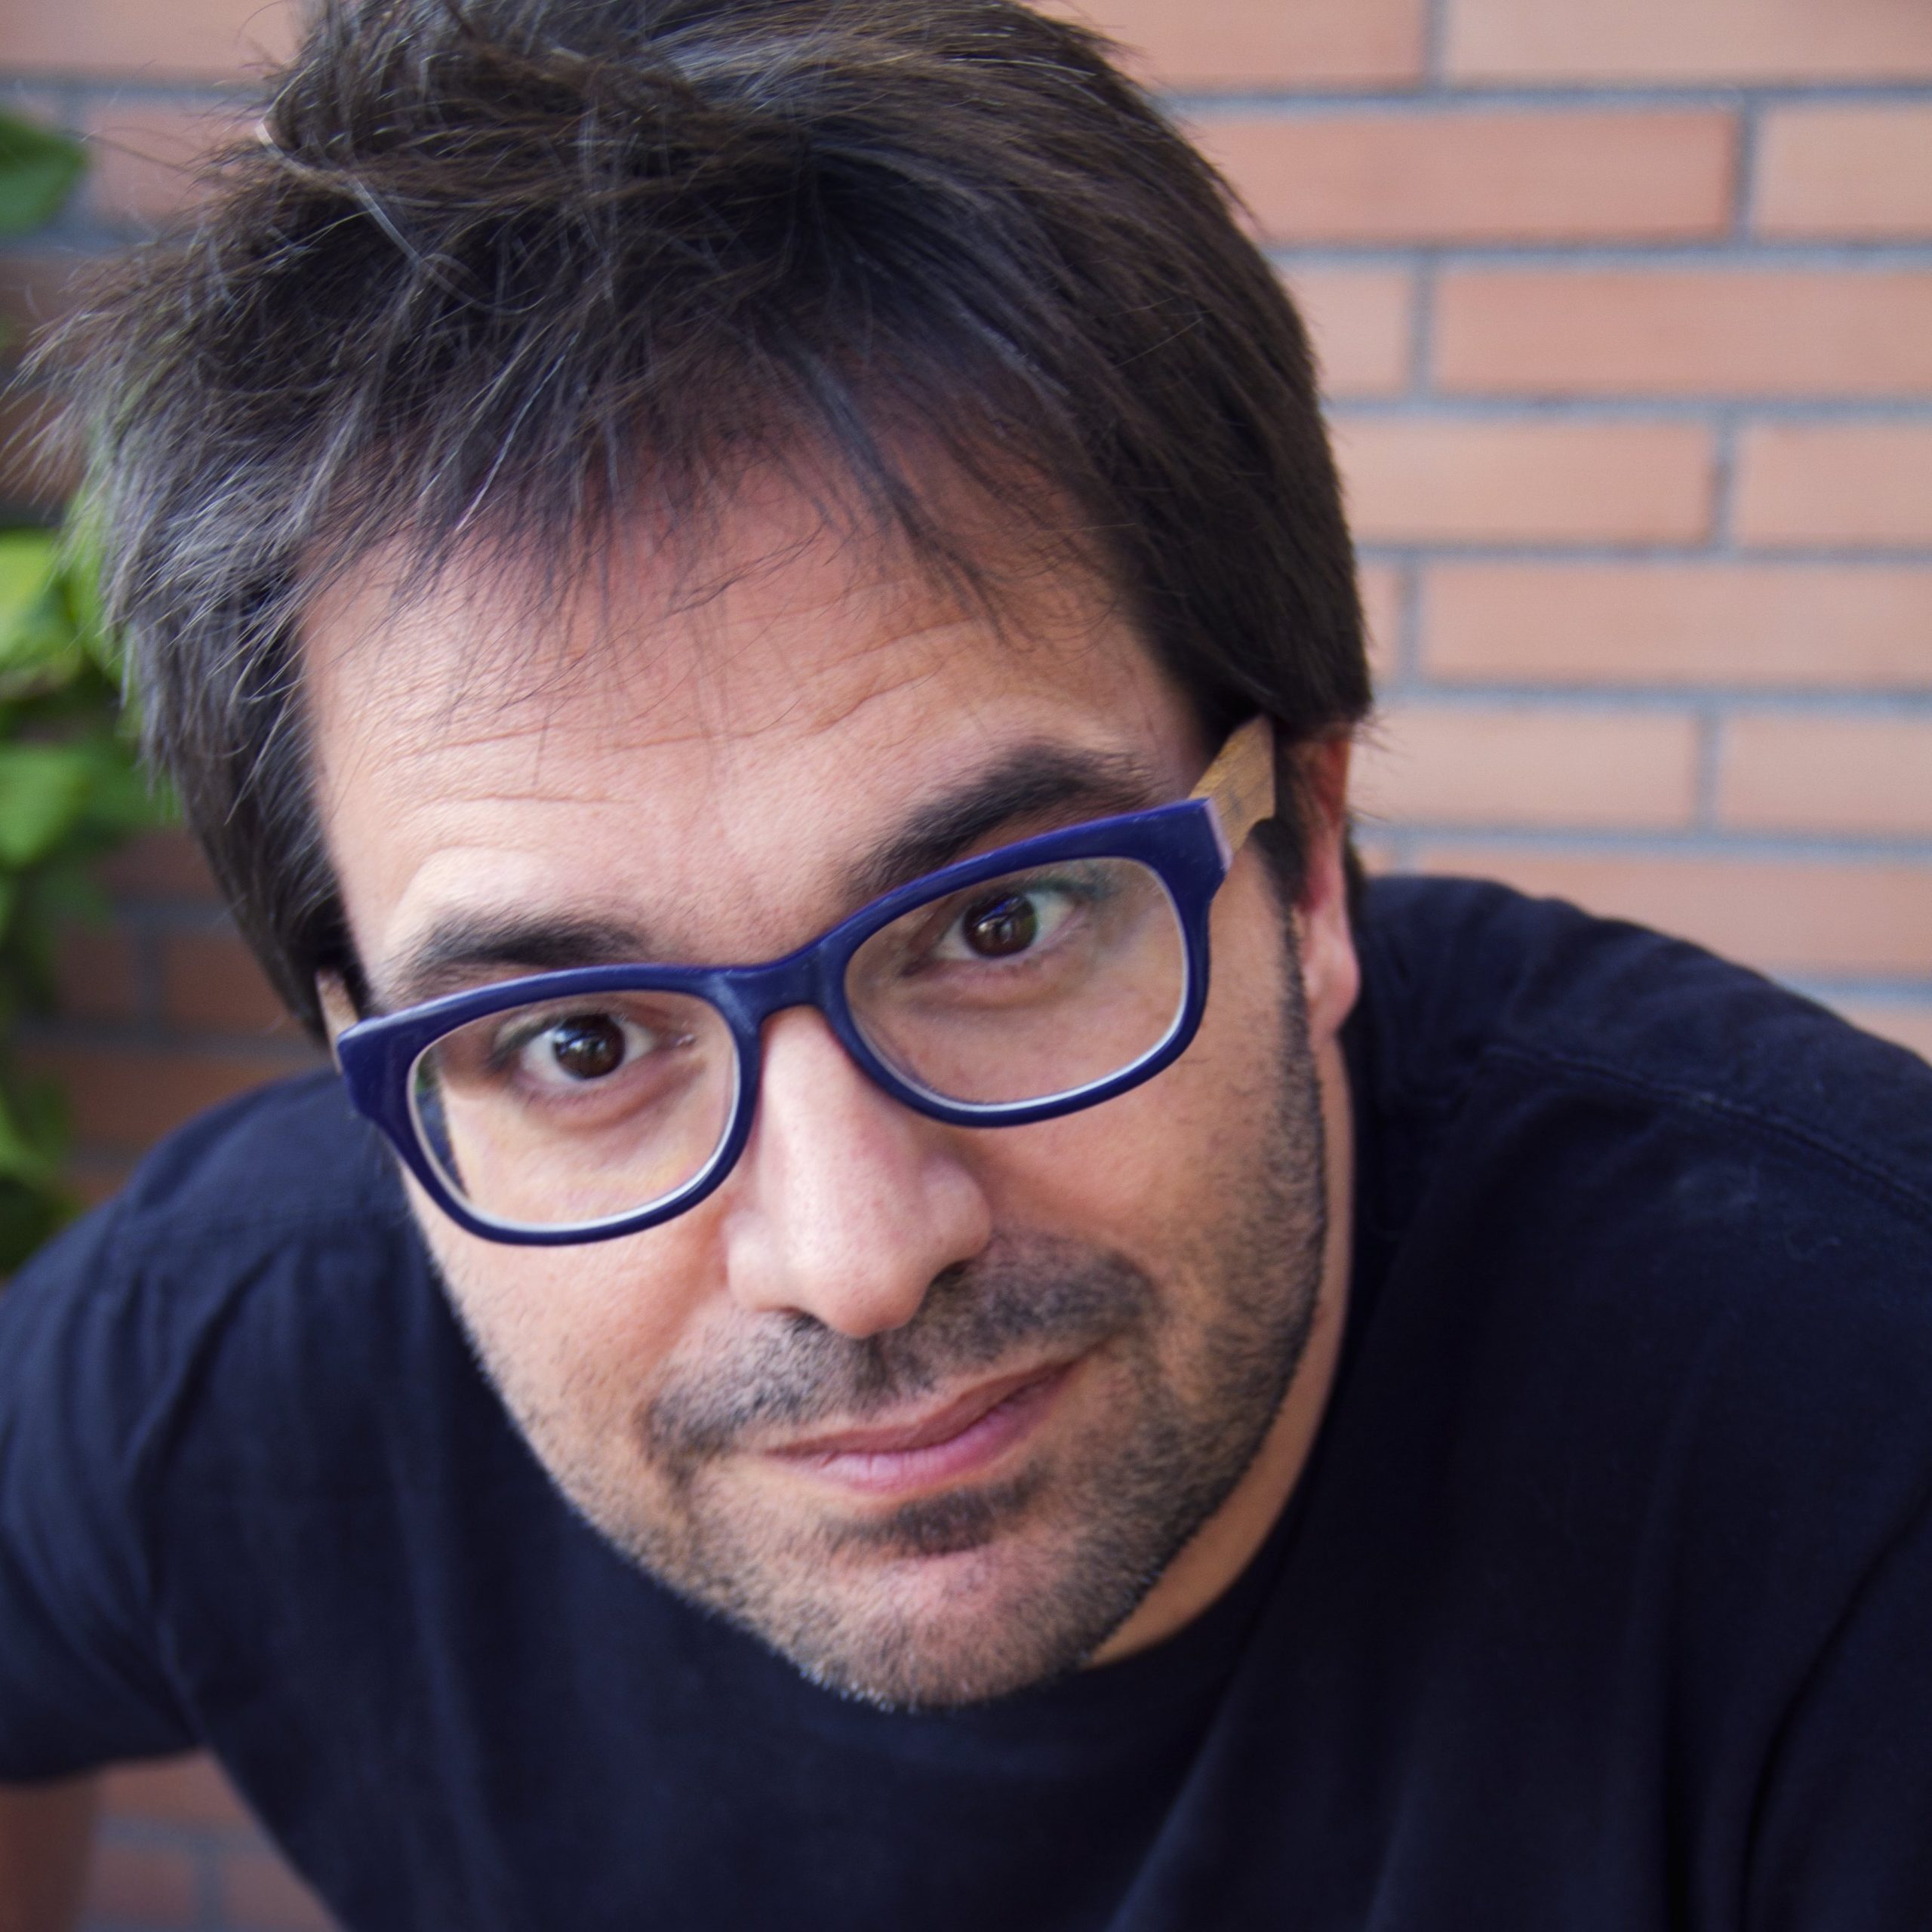 Perfil de Jaime Bartolomé